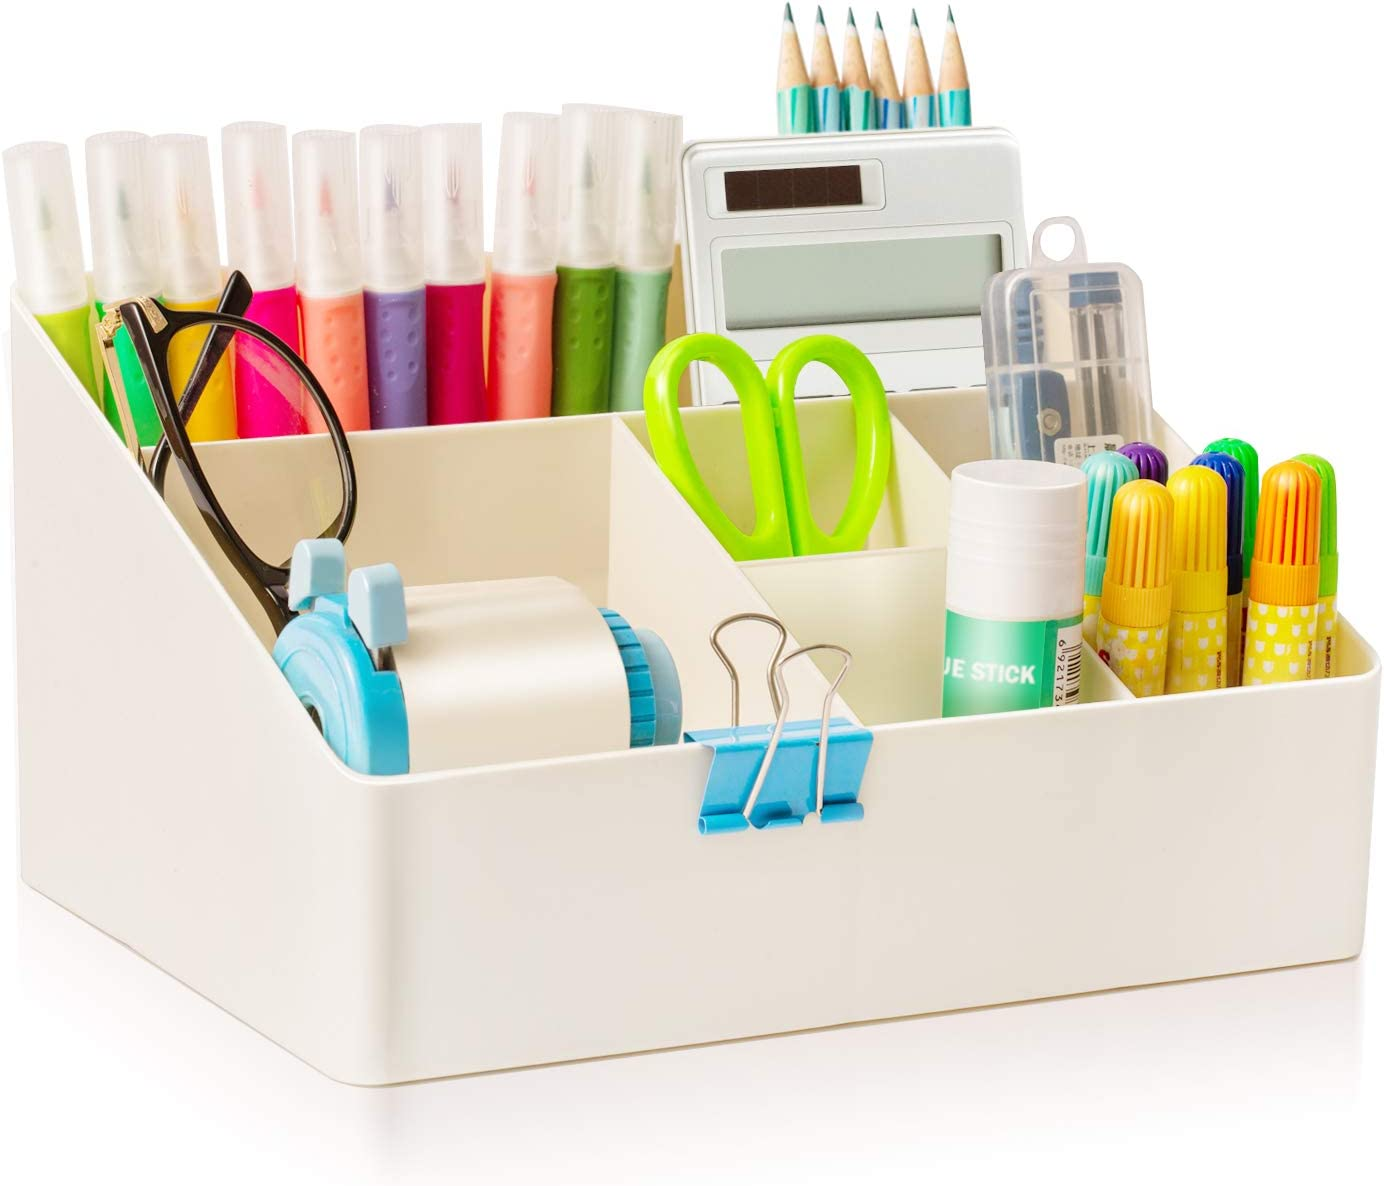 JUPAI Desktop Organizer Box, Organizer Bin for Cosmetic, Storage box for Office Supplies, Remote Control Holder, Lattice,White